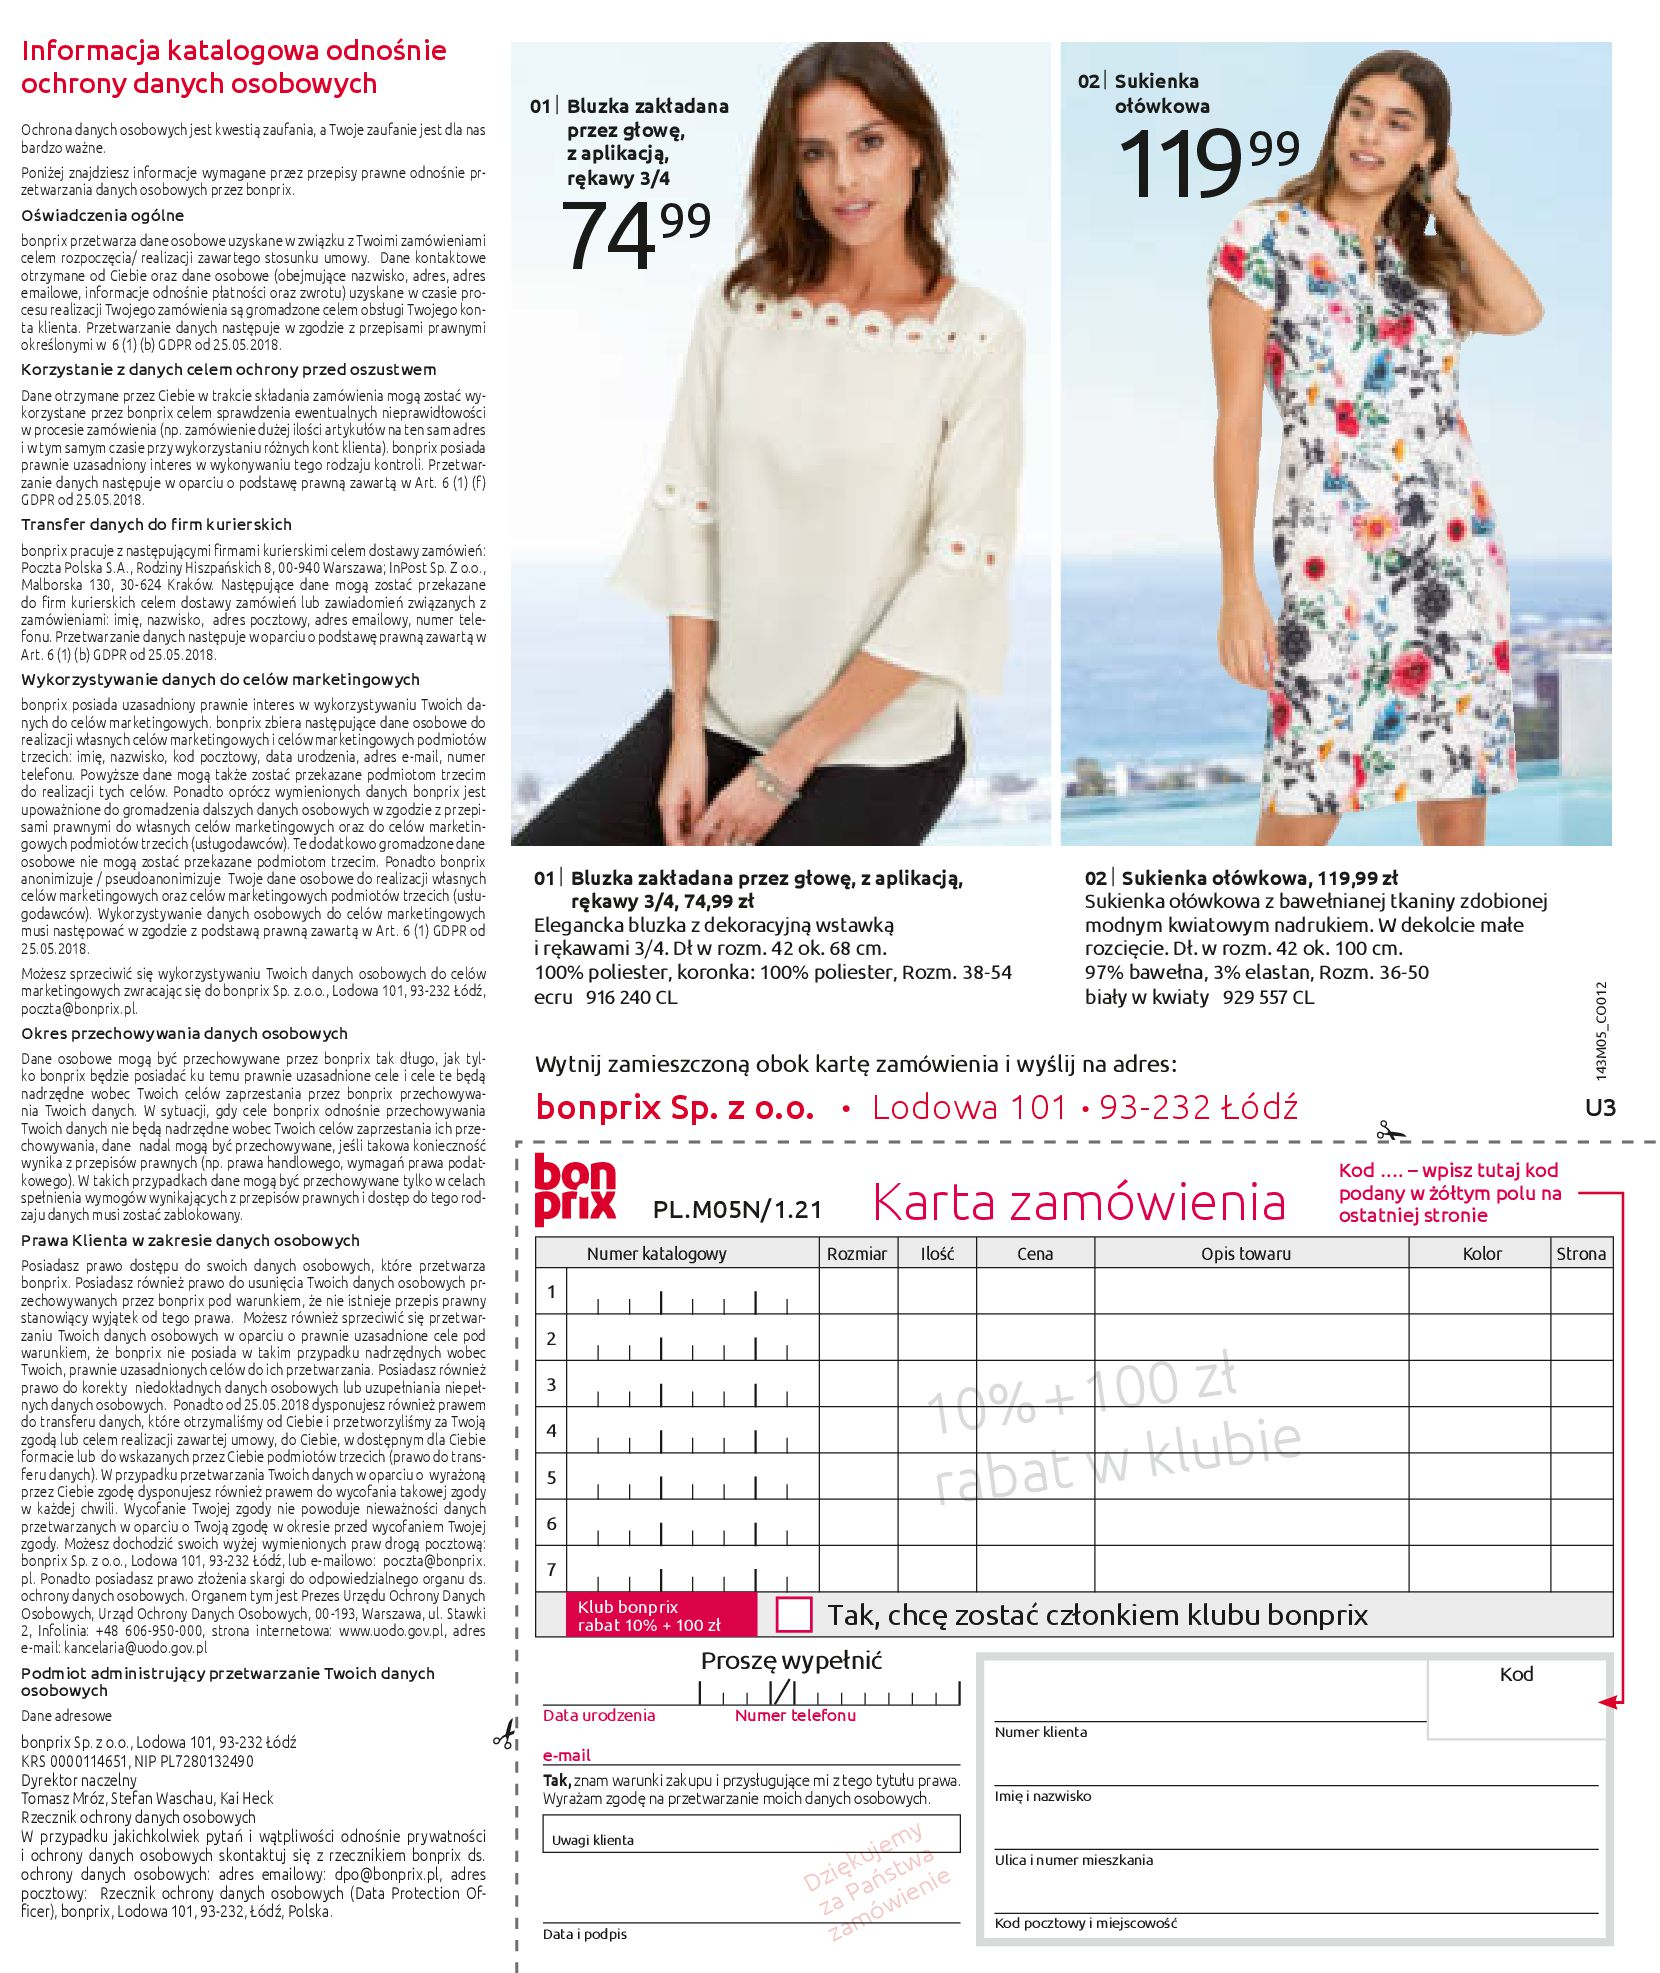 Gazetka Bonprix: Katalog Bonprix Letnie klimaty 2021-05-26 page-99